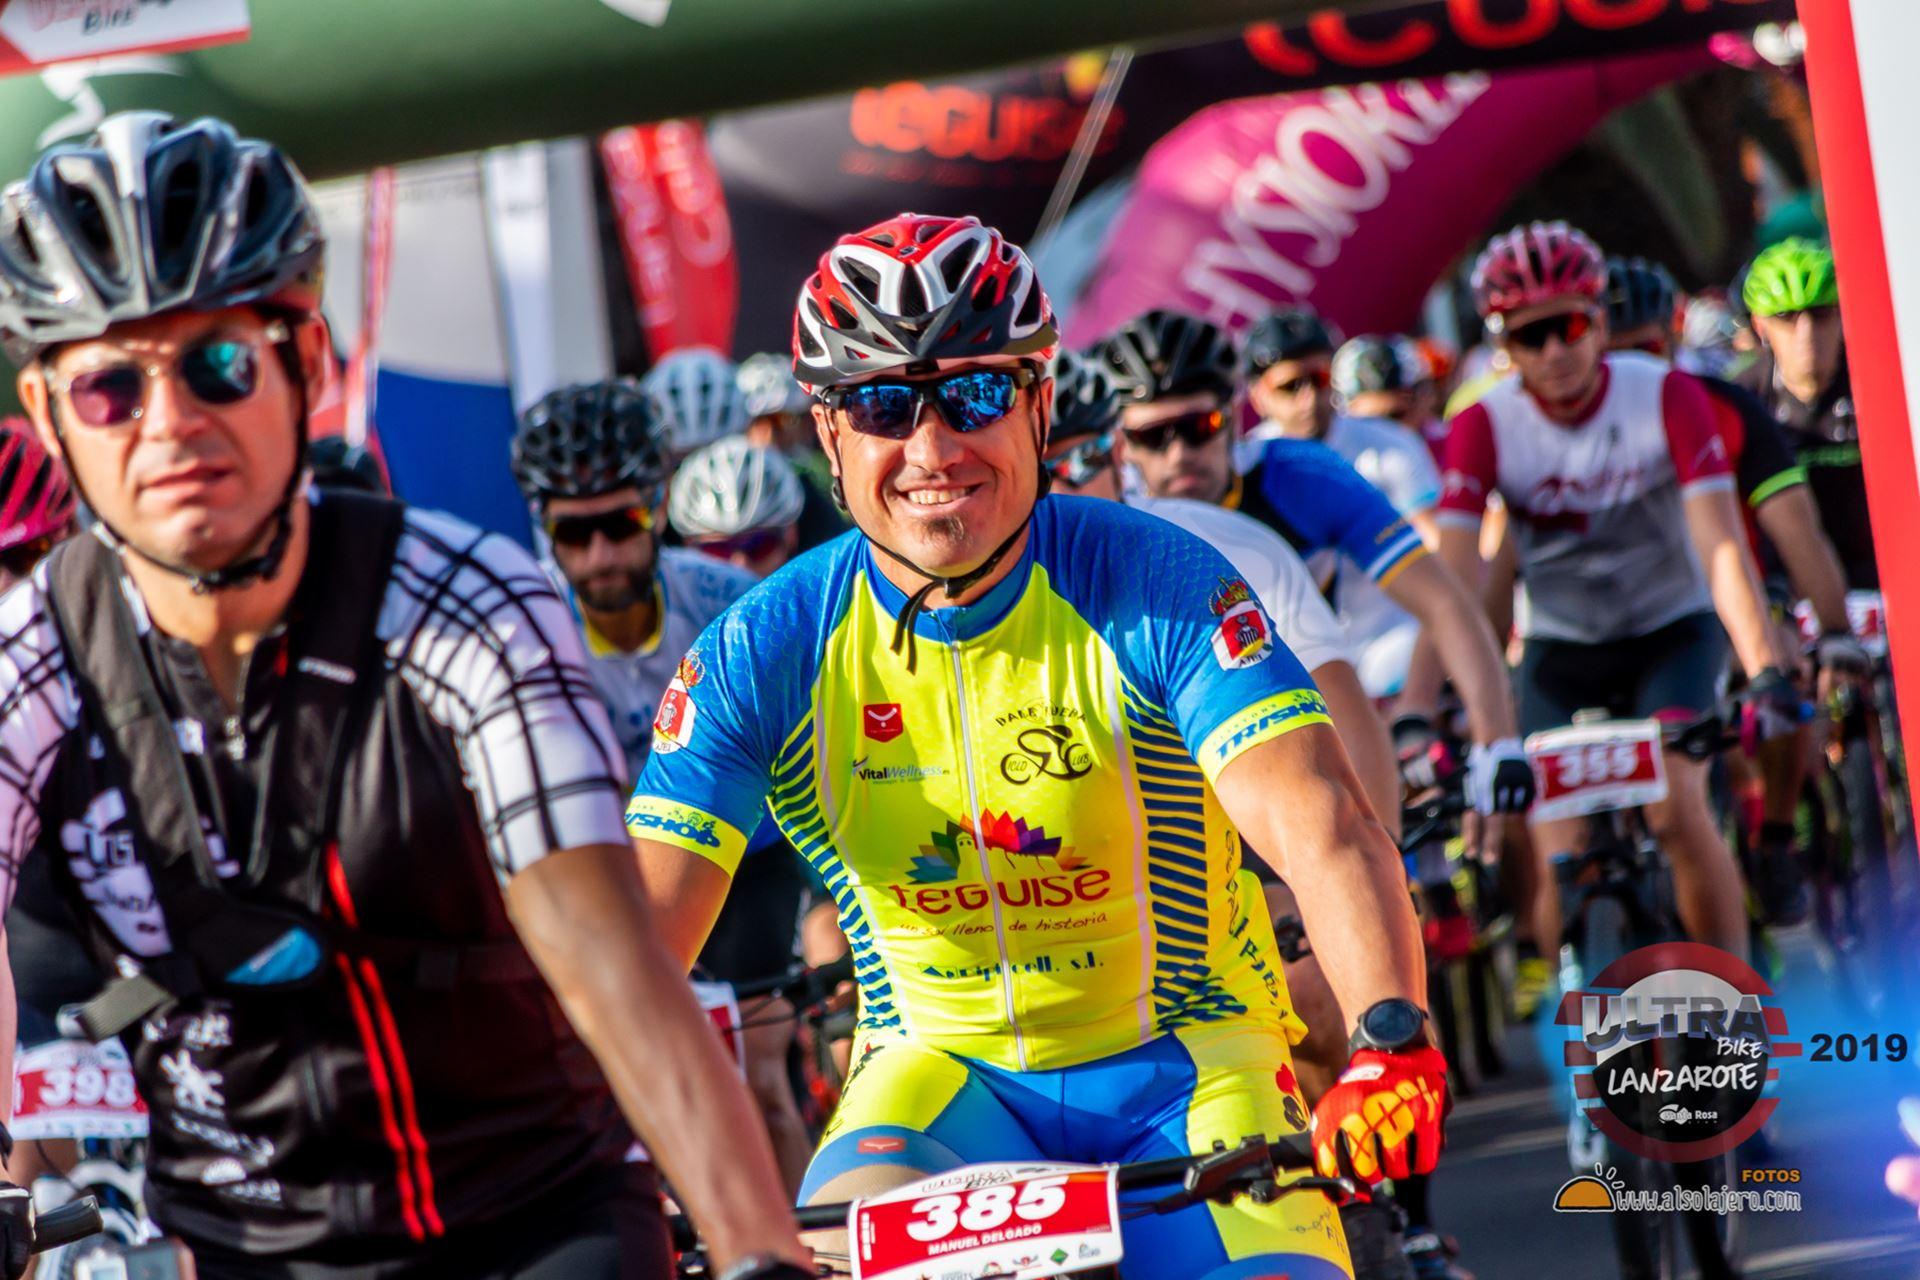 Salida 2ª Etapa Ultrabike 2019 Fotos Alsolajero.com-50